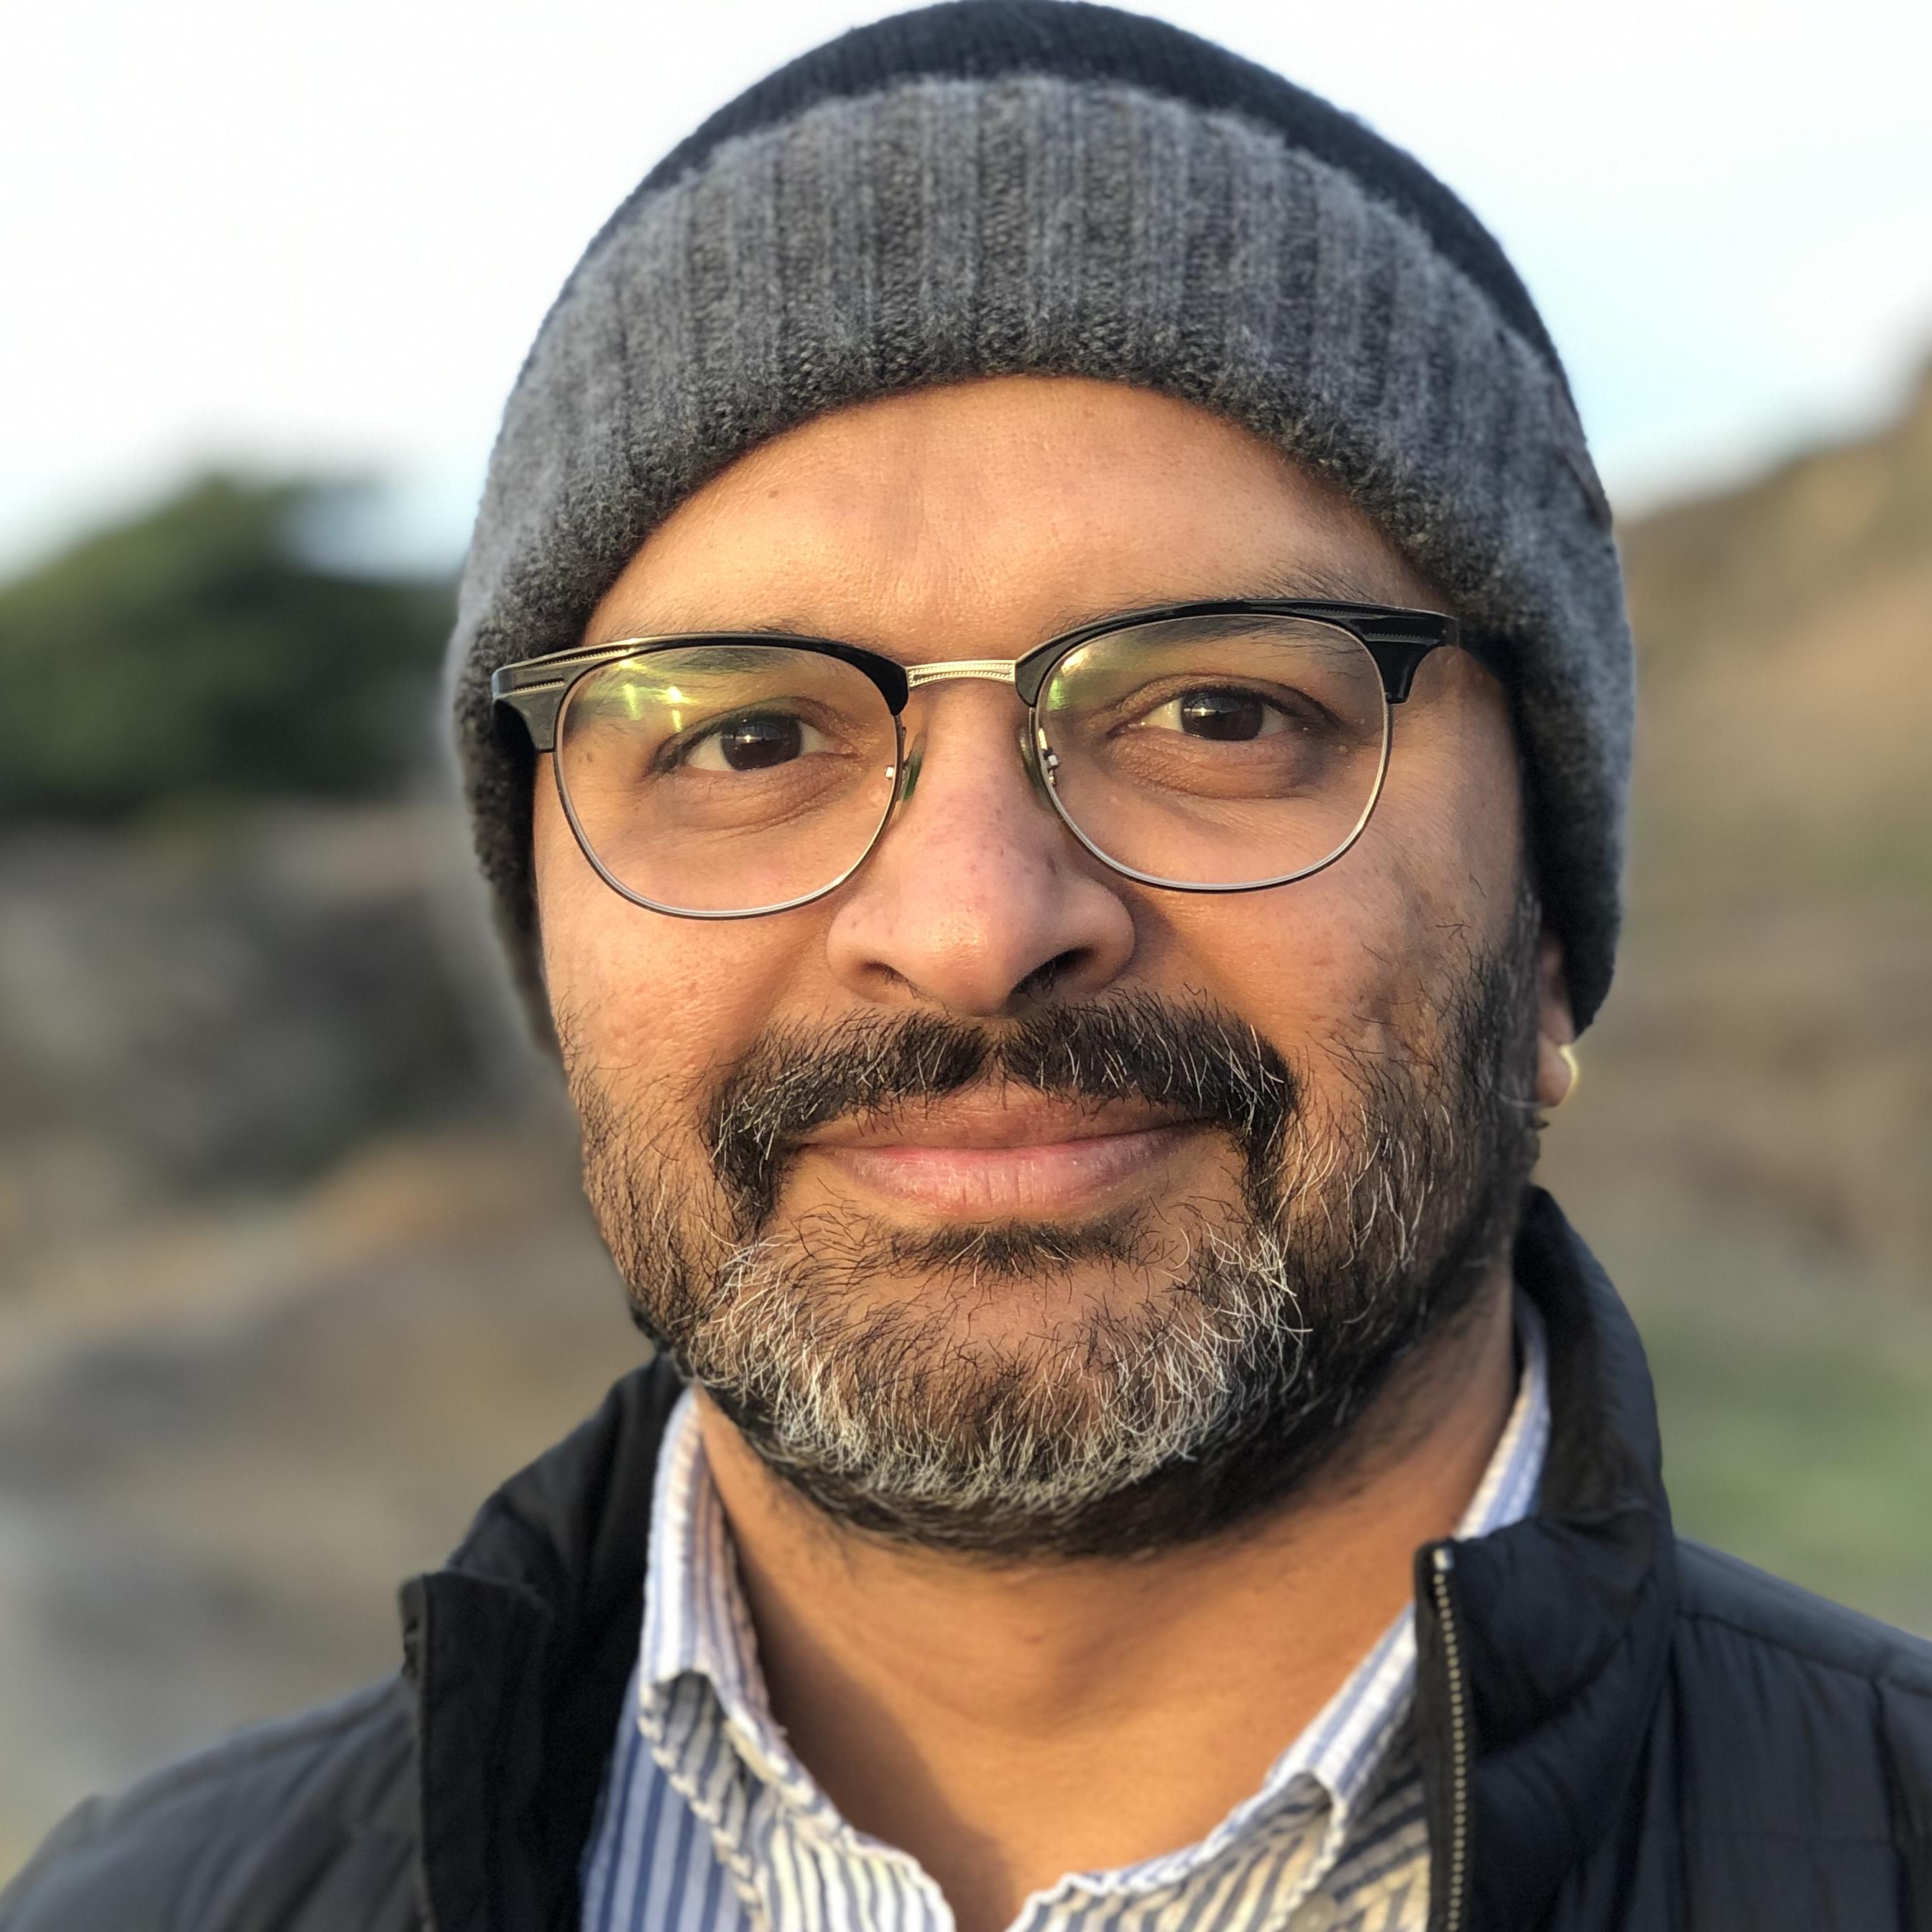 Aditya Alurkar from Self Employed